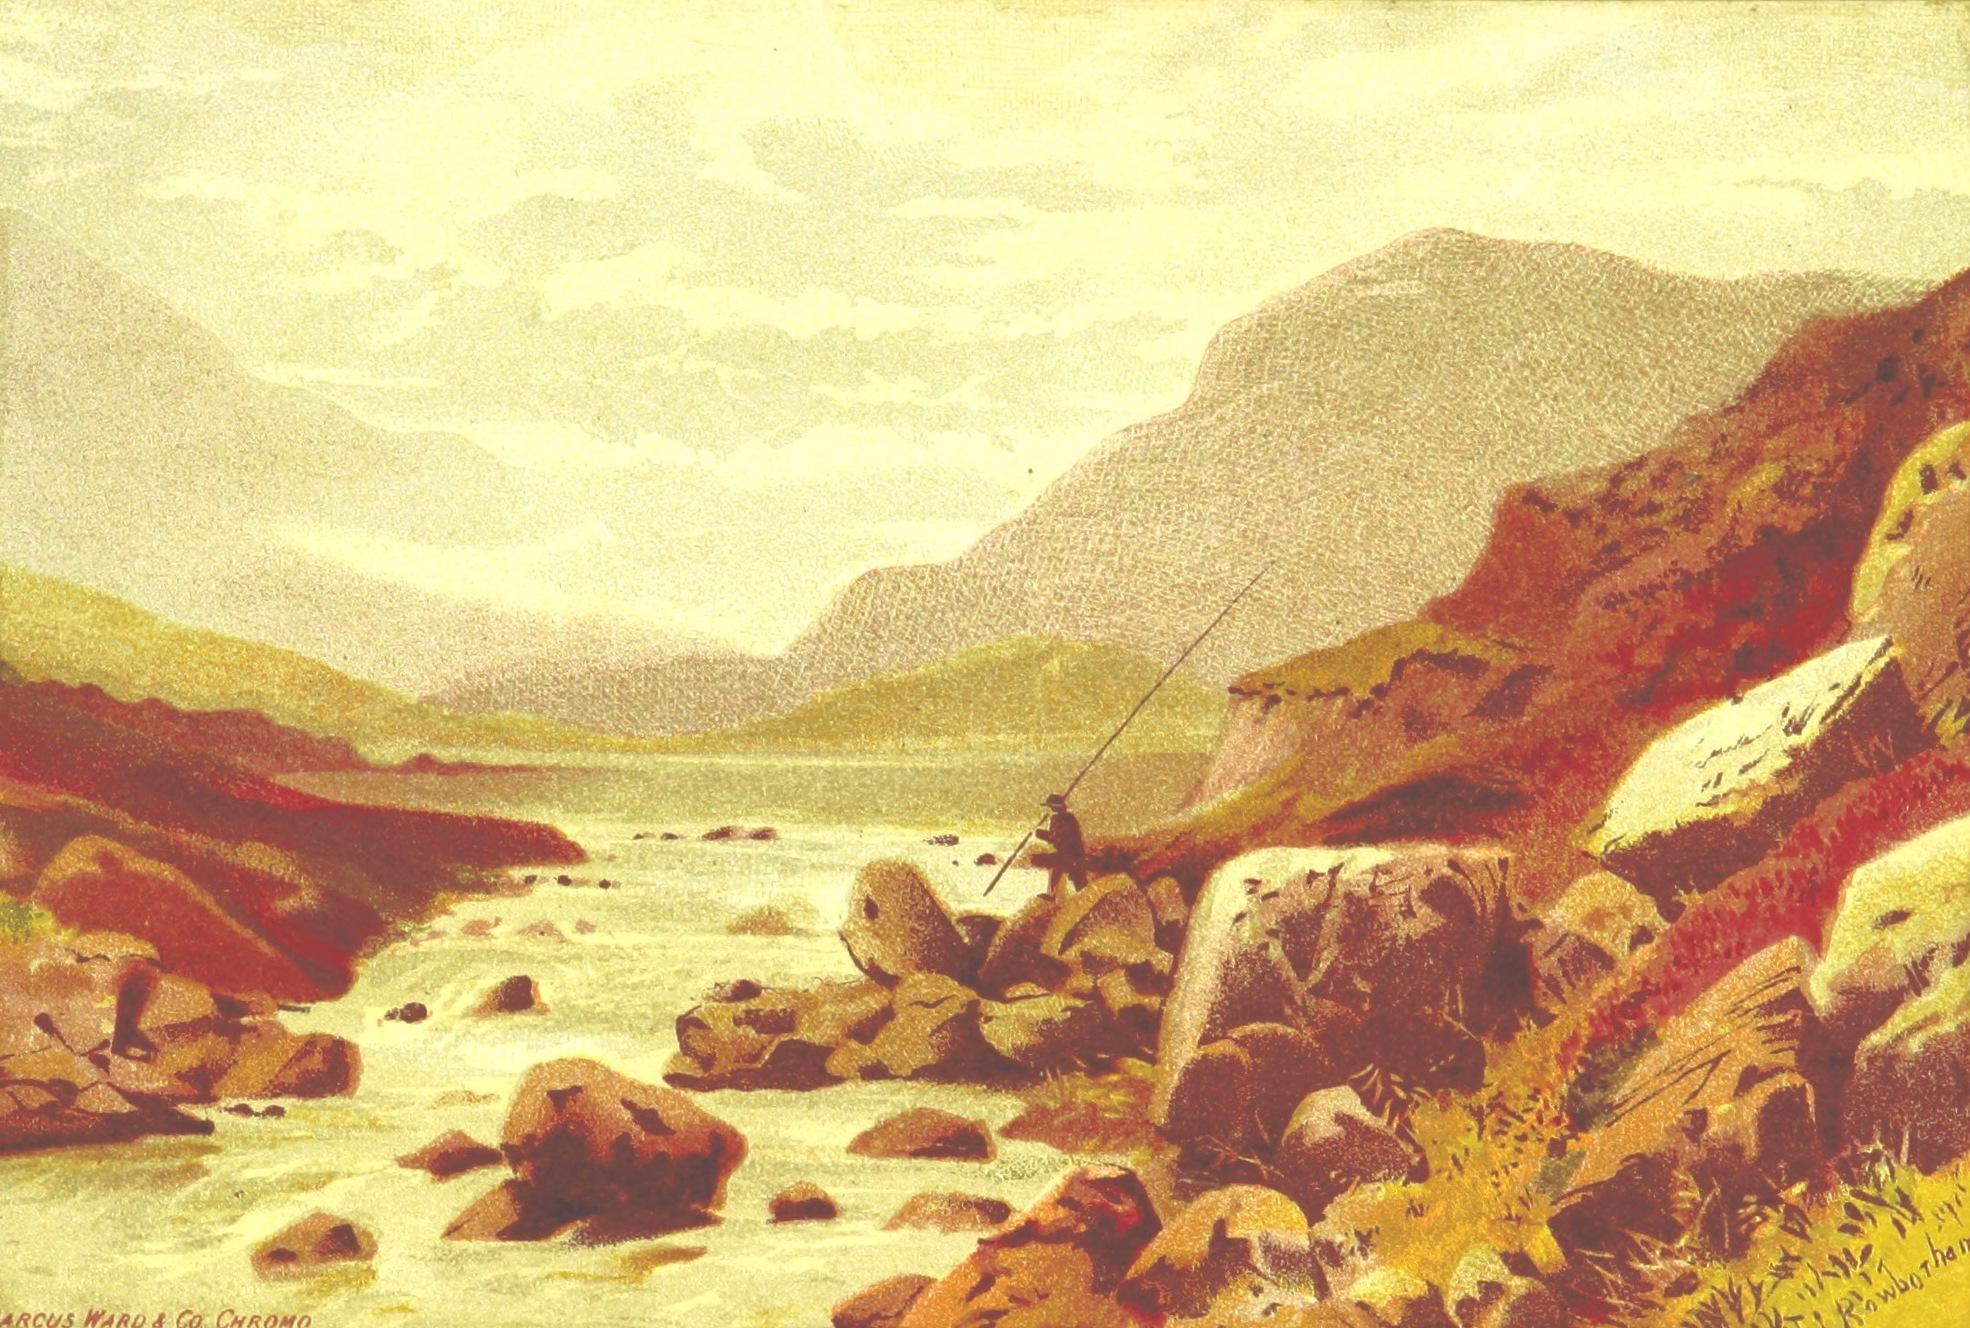 Views of Wicklow and Killarney - Gap of Dunloe (1875)